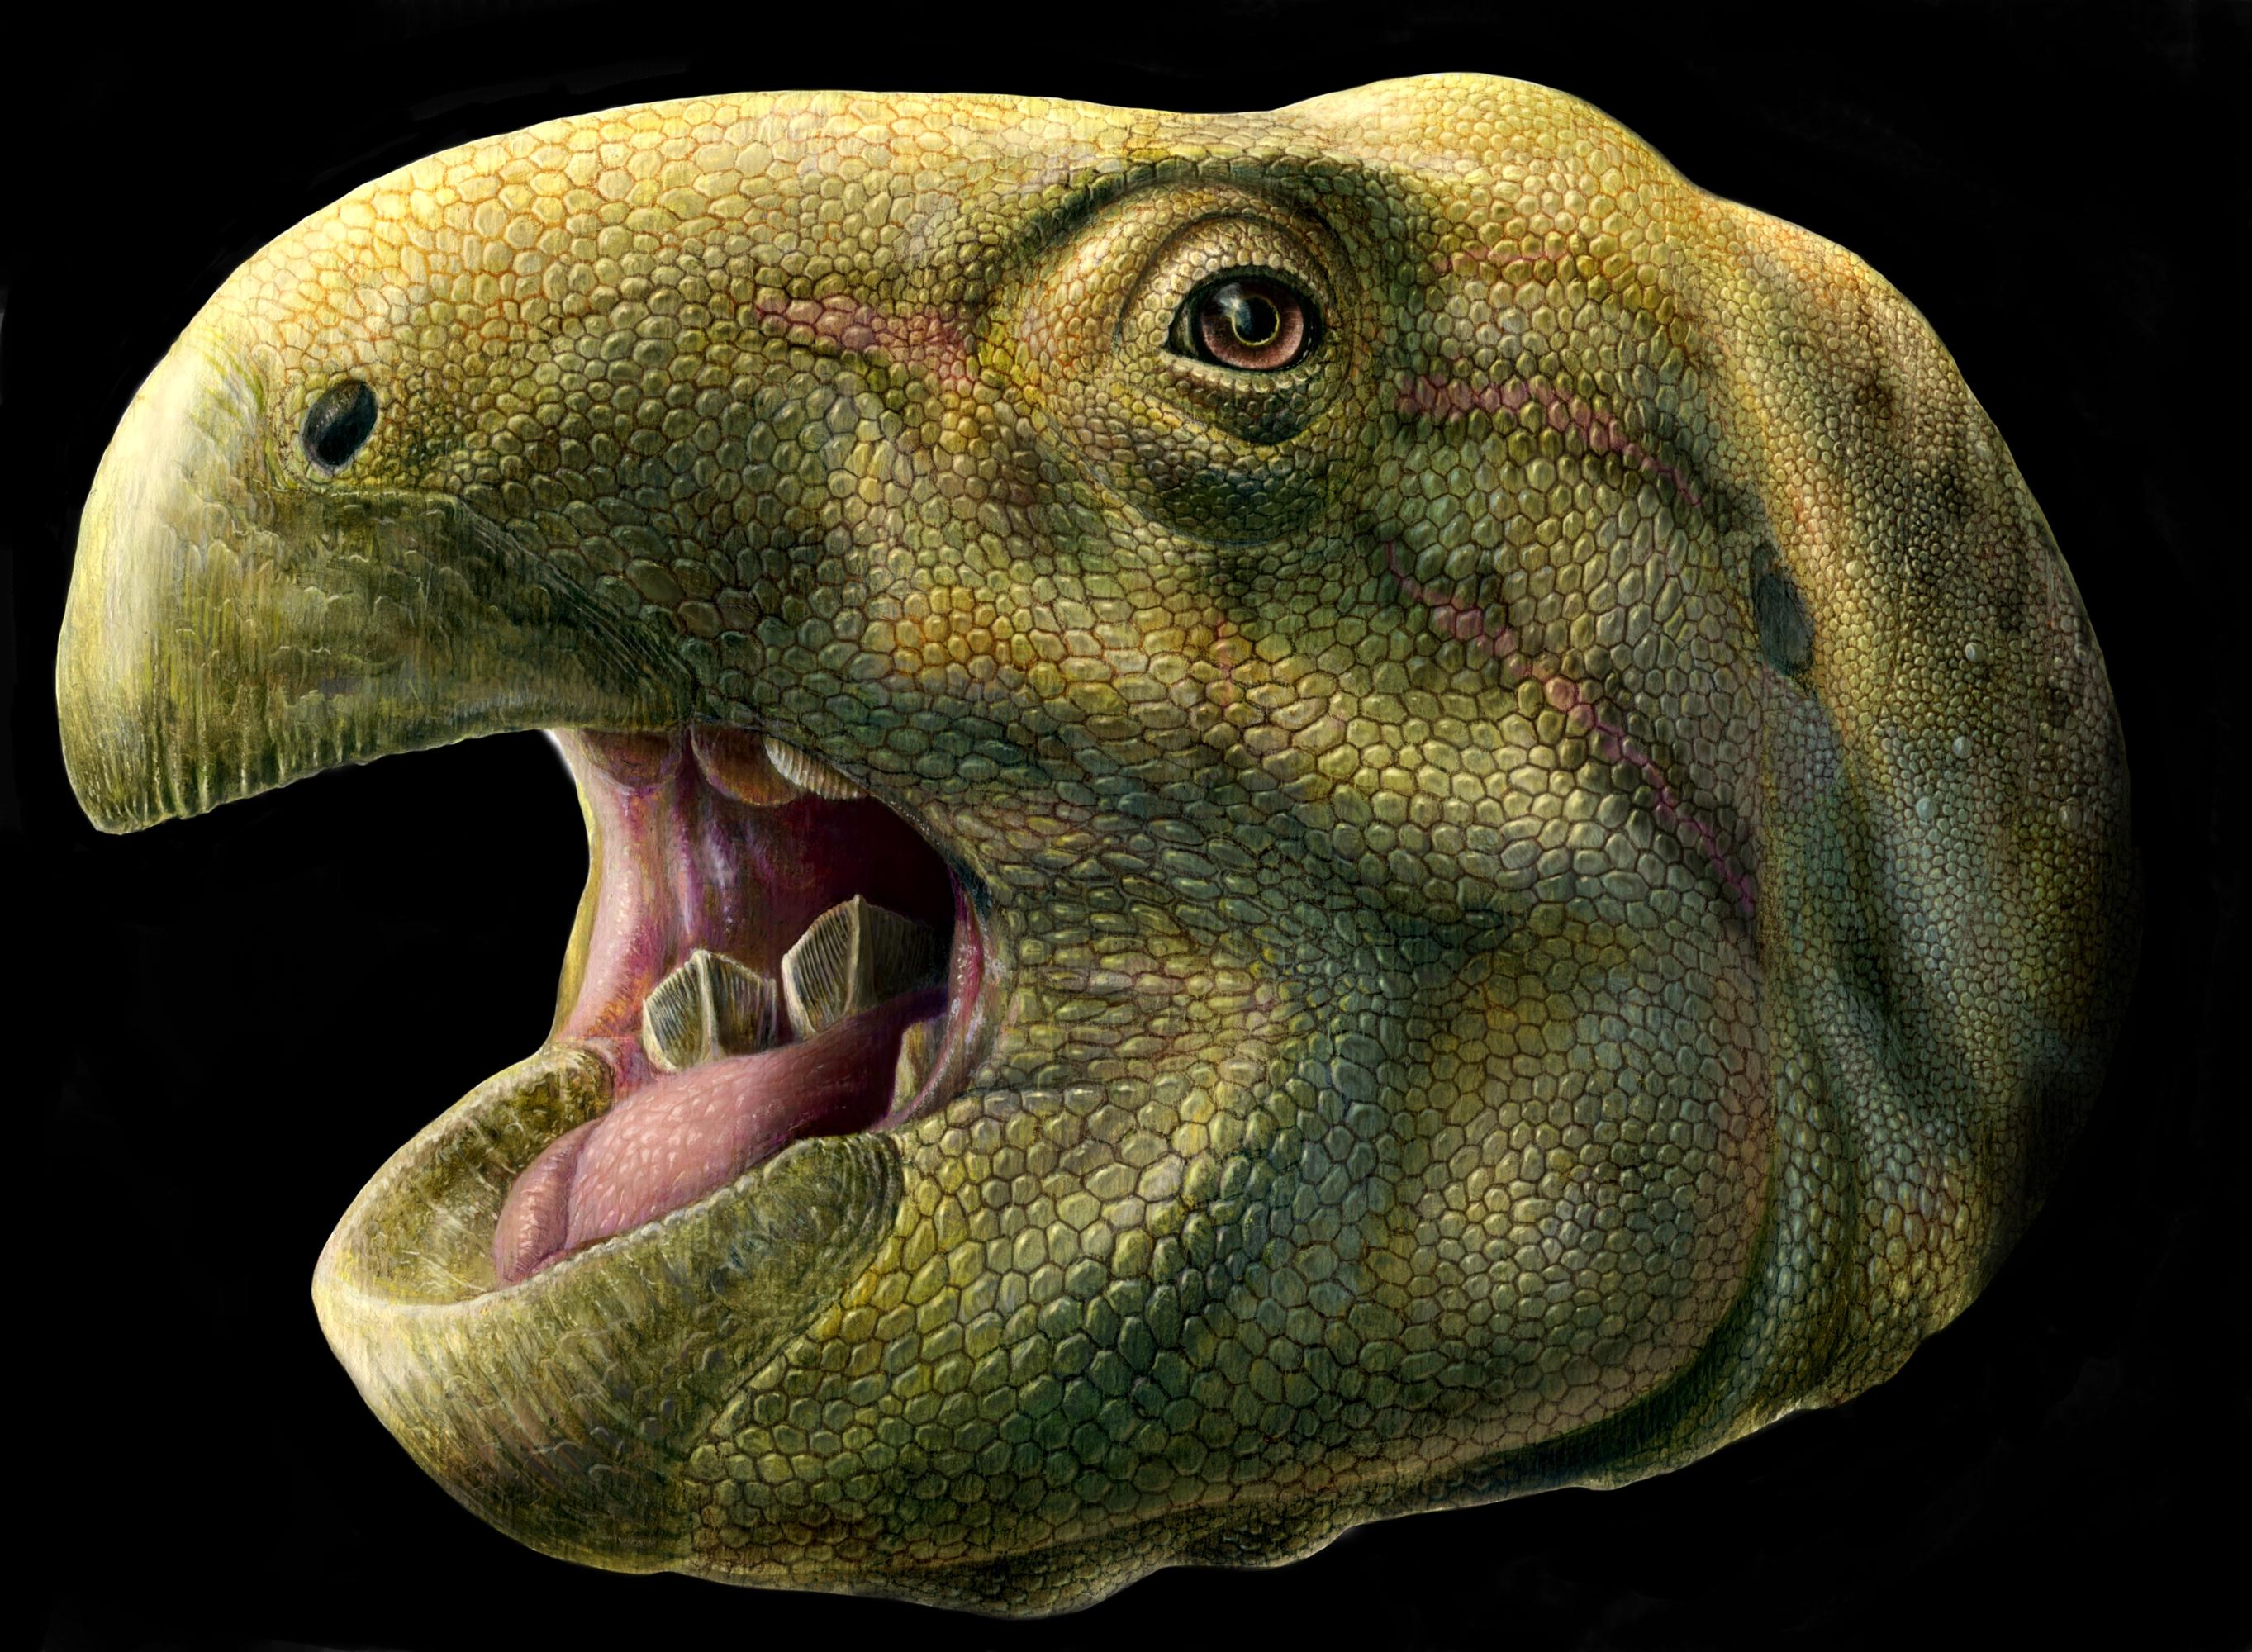 An artistic reconstruction of Matheronodon provincialis's head. Say aaahhhhh.